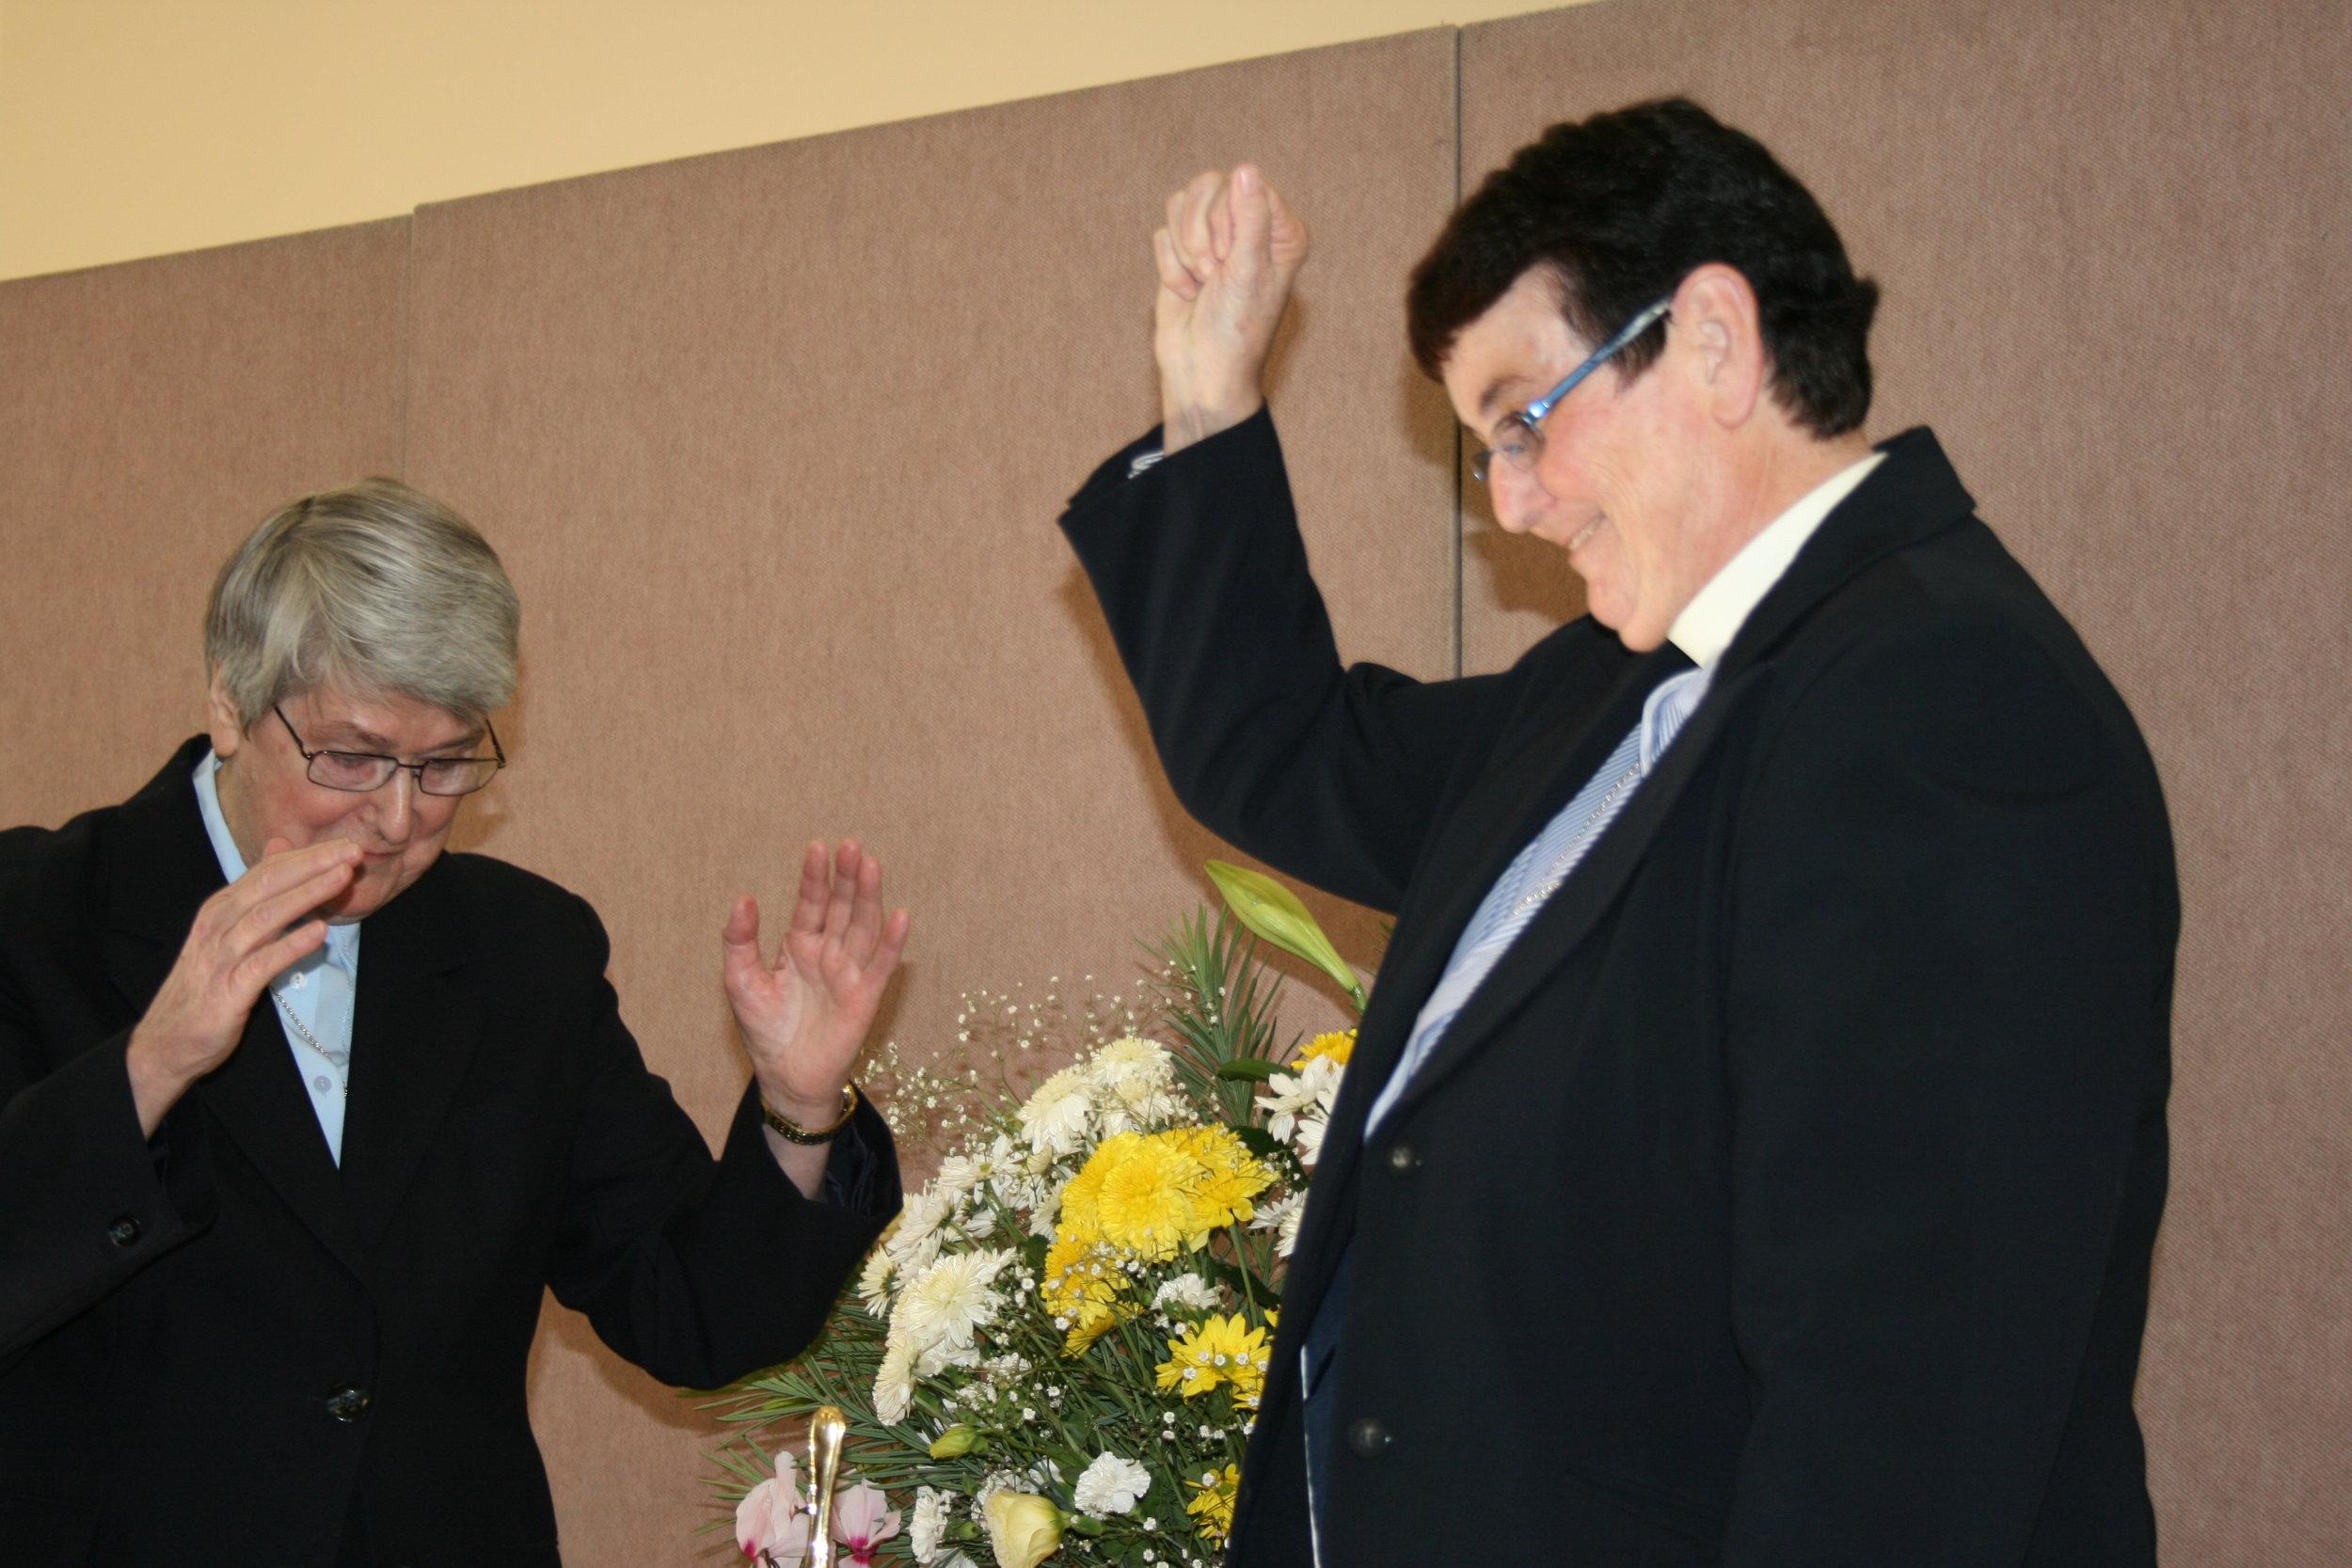 Celebrating Sr Juliana's 25th anniversary of profession .